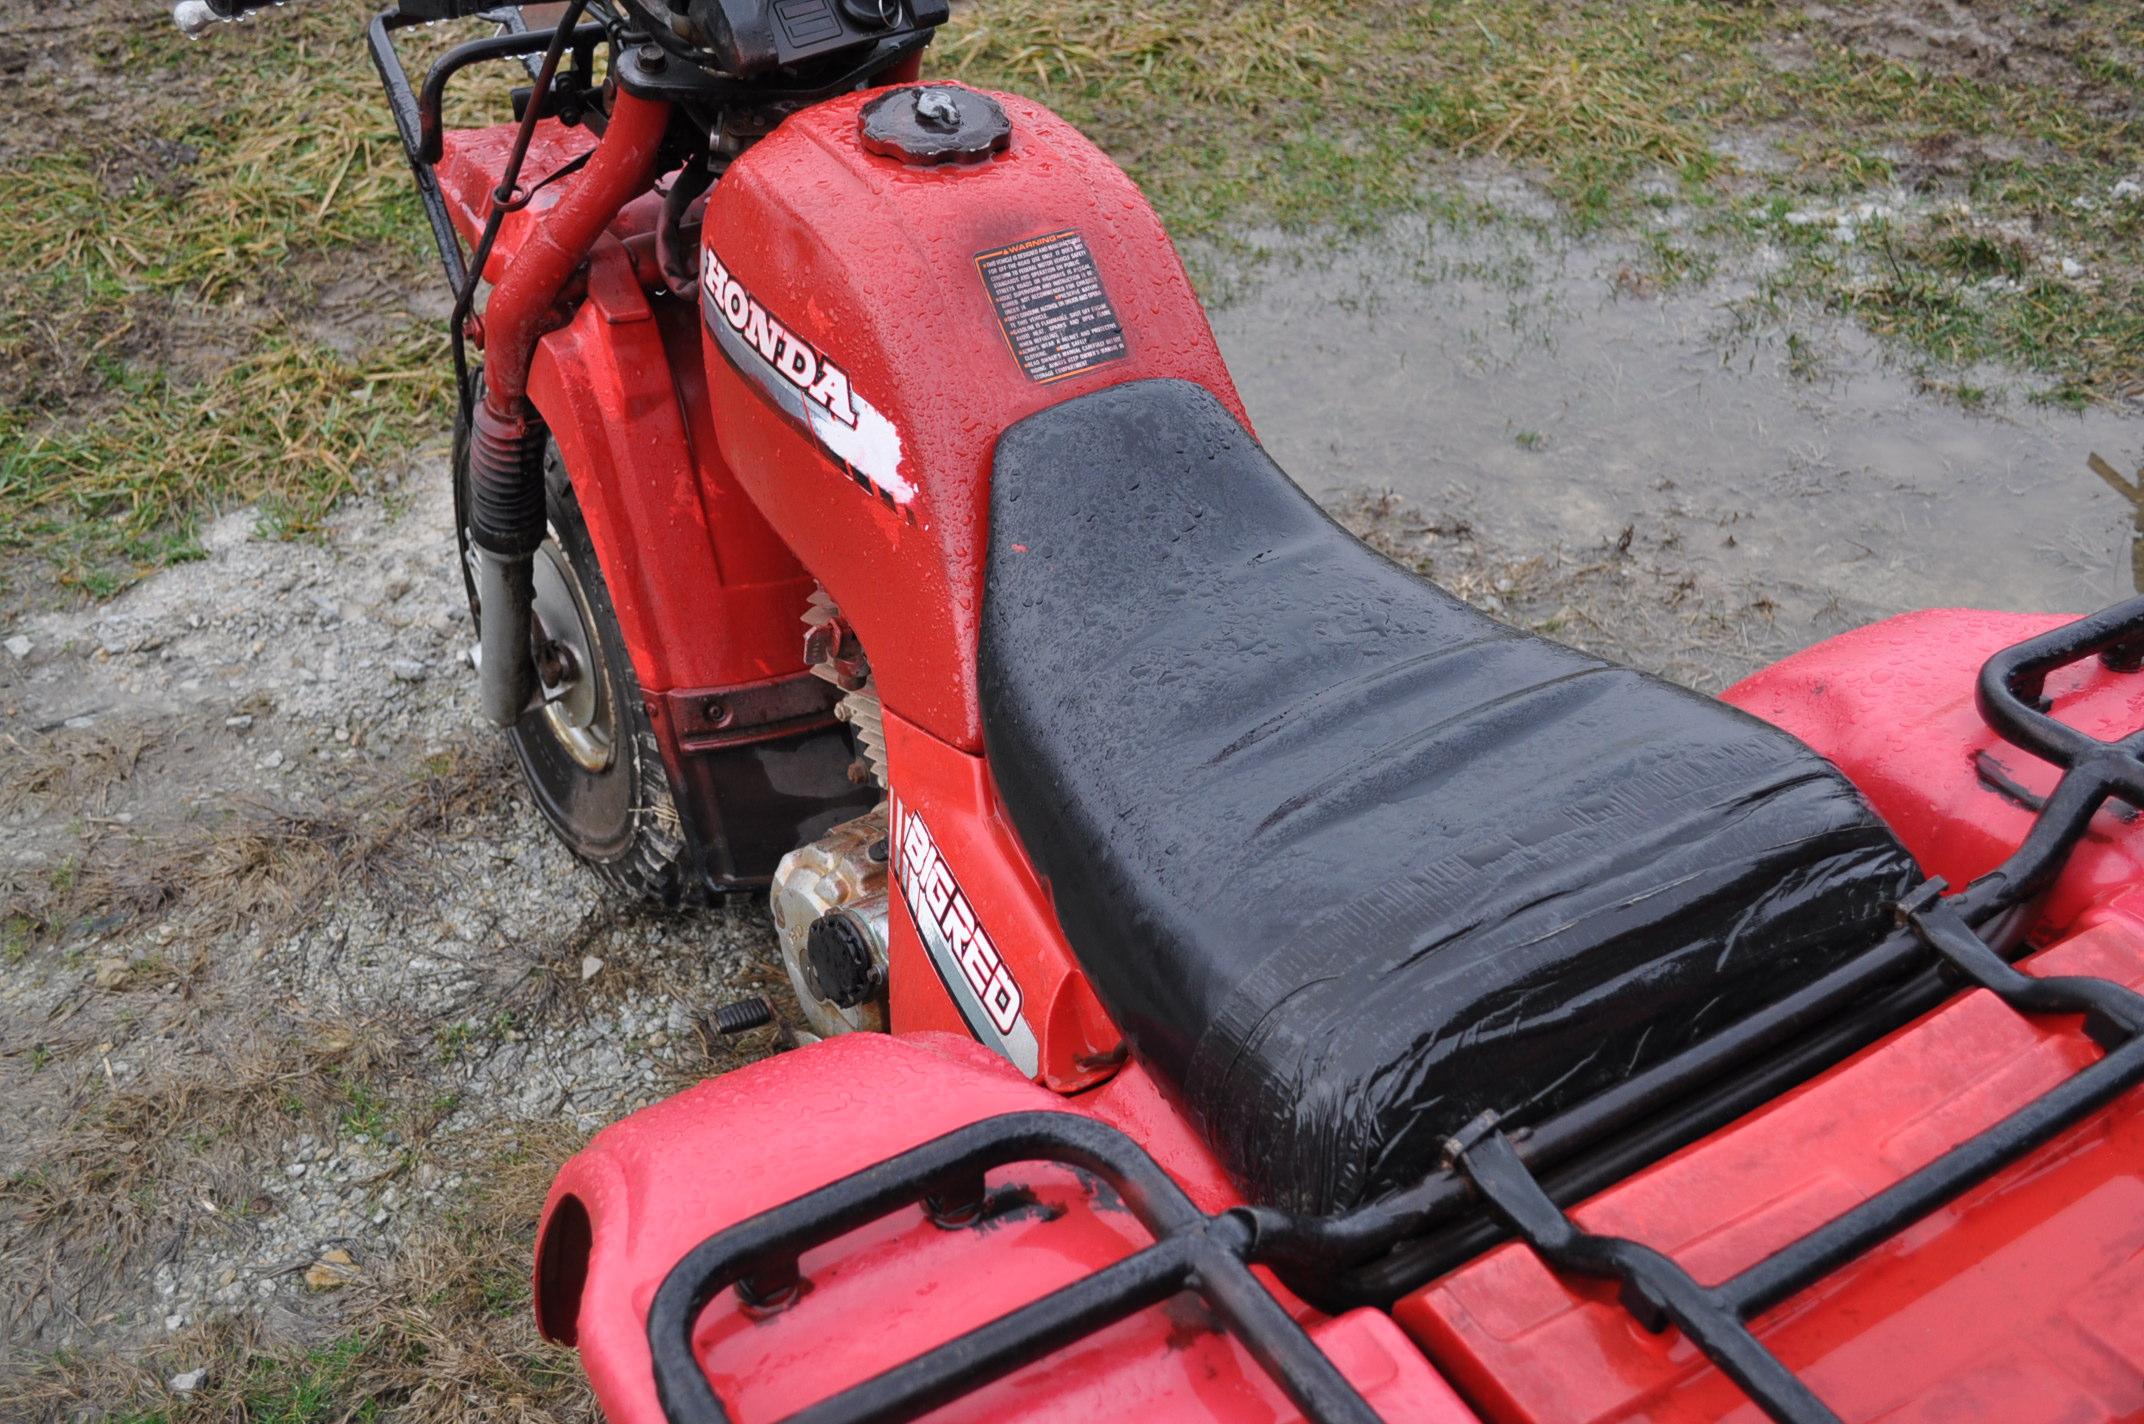 Honda Big Red 3-wheeler, new 25 x 12.00-9 tires - Image 8 of 8